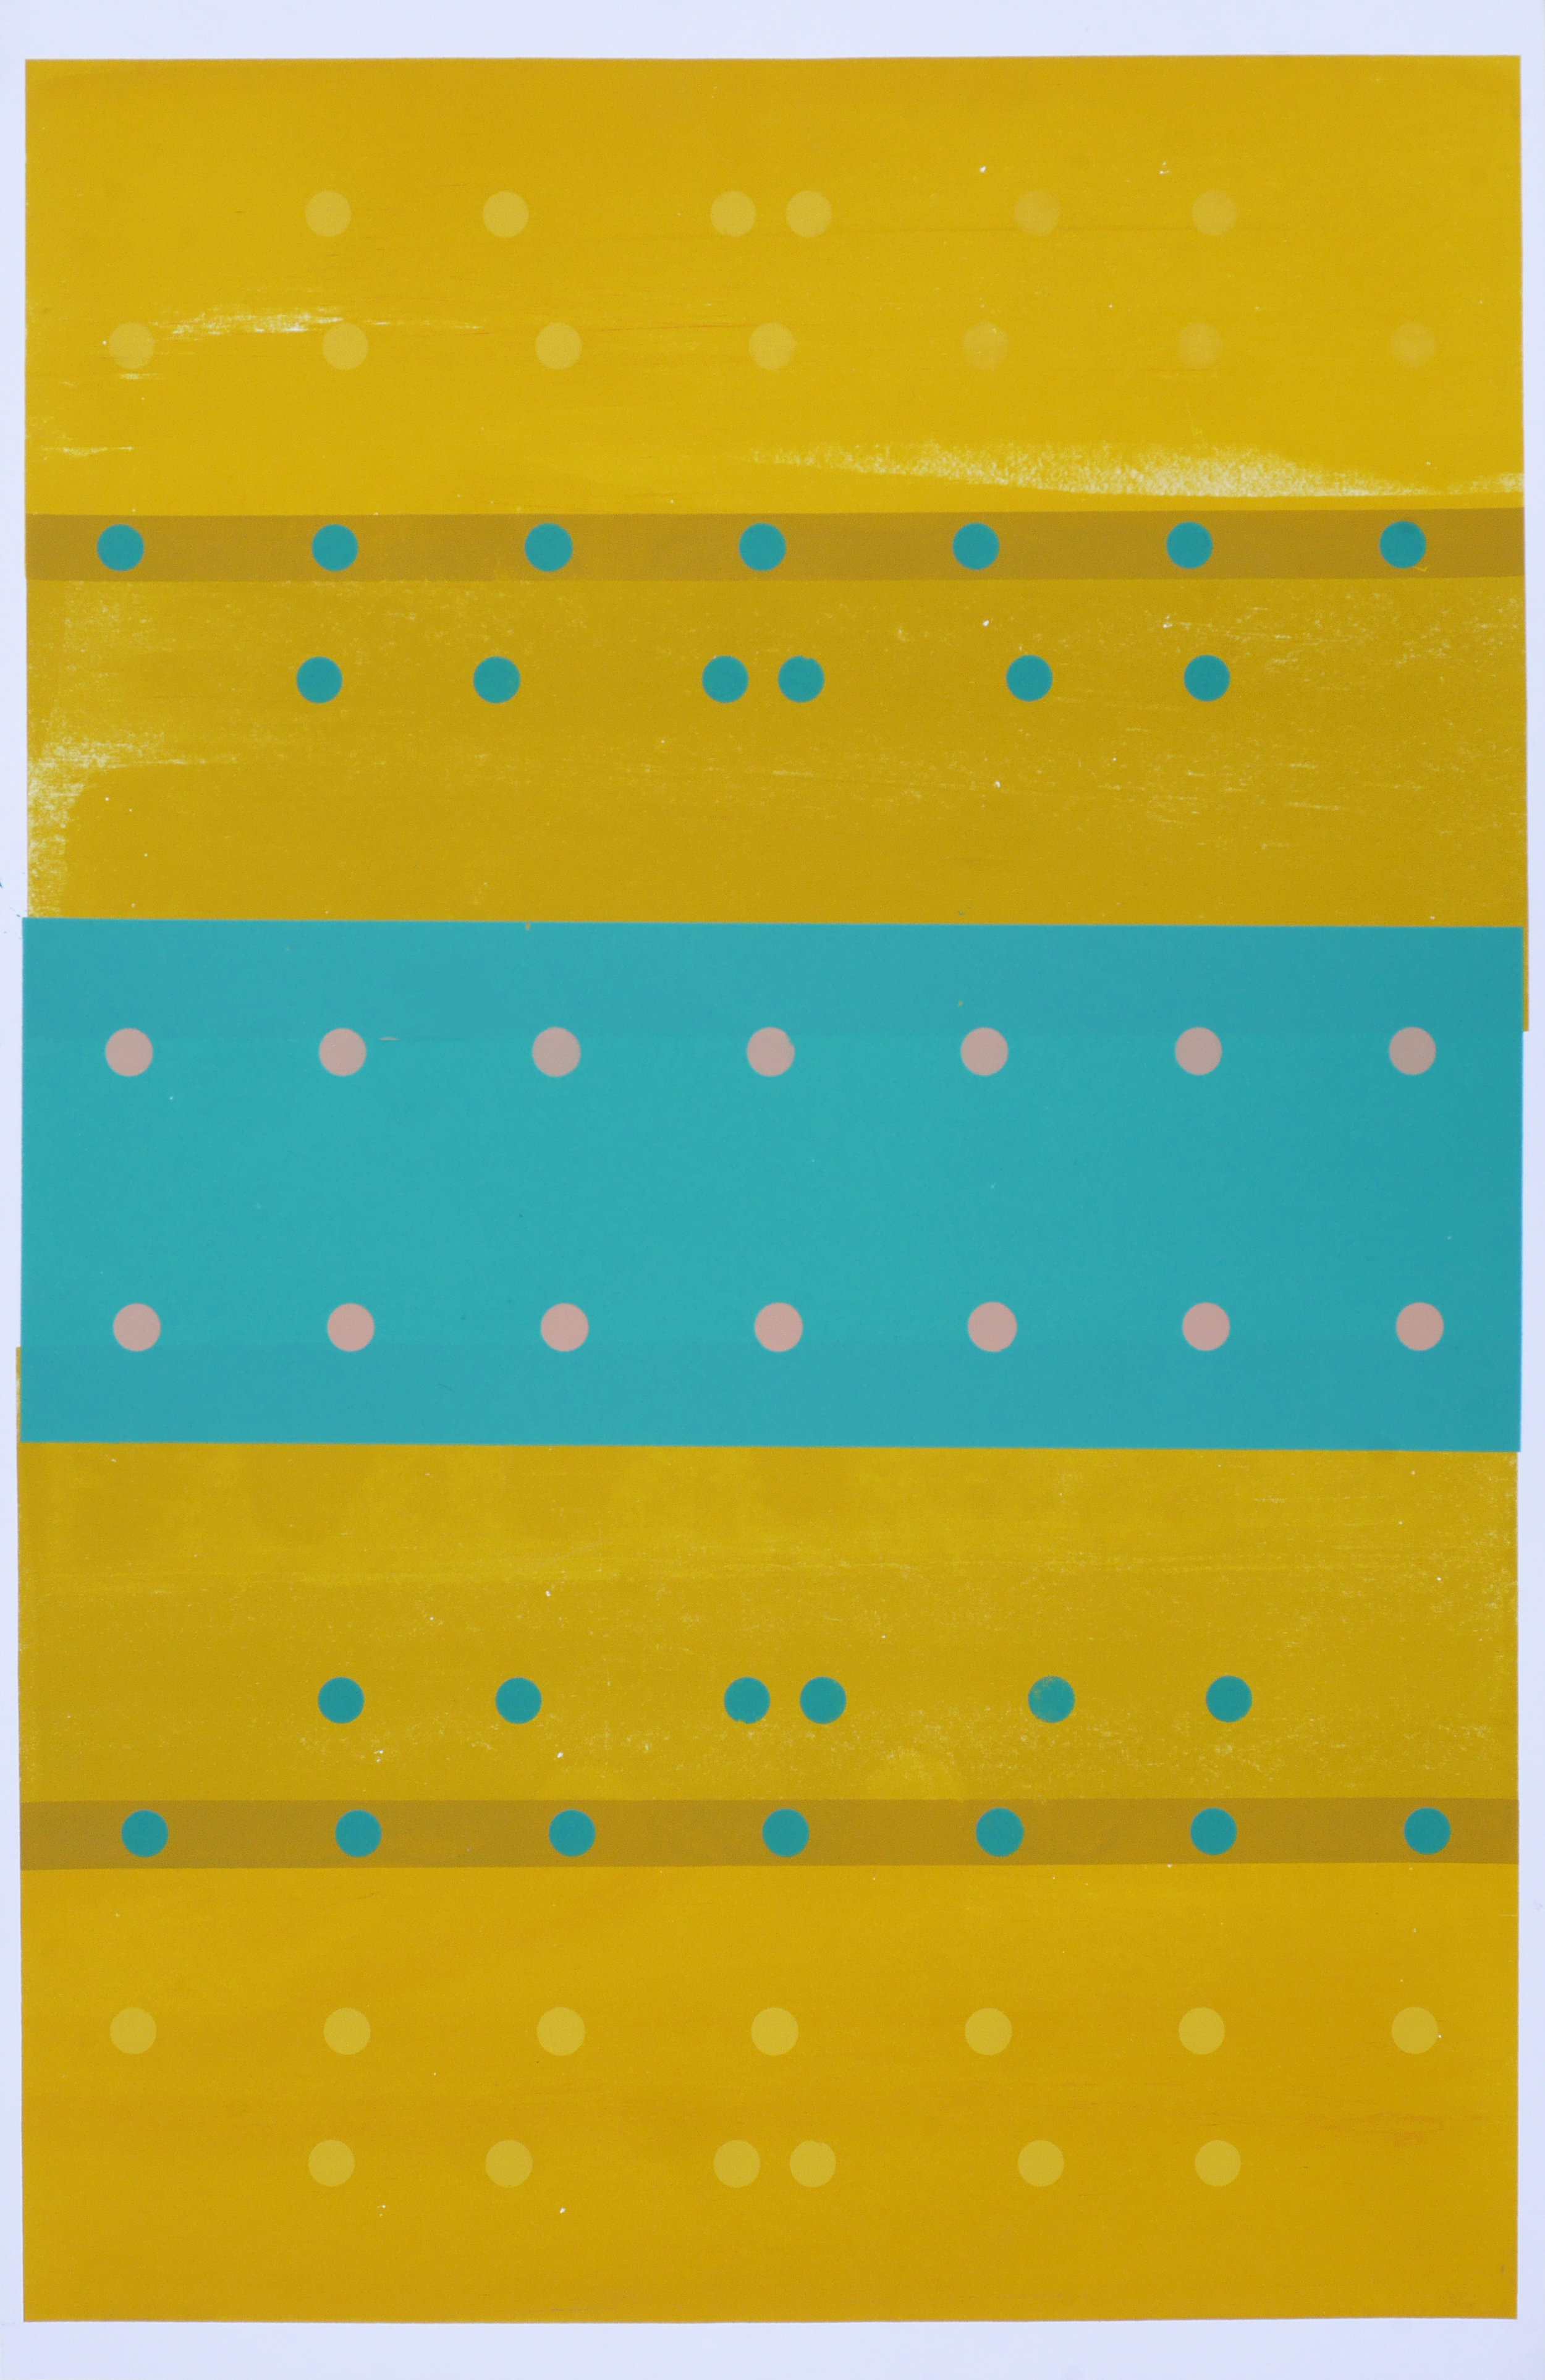 Tapestry 012